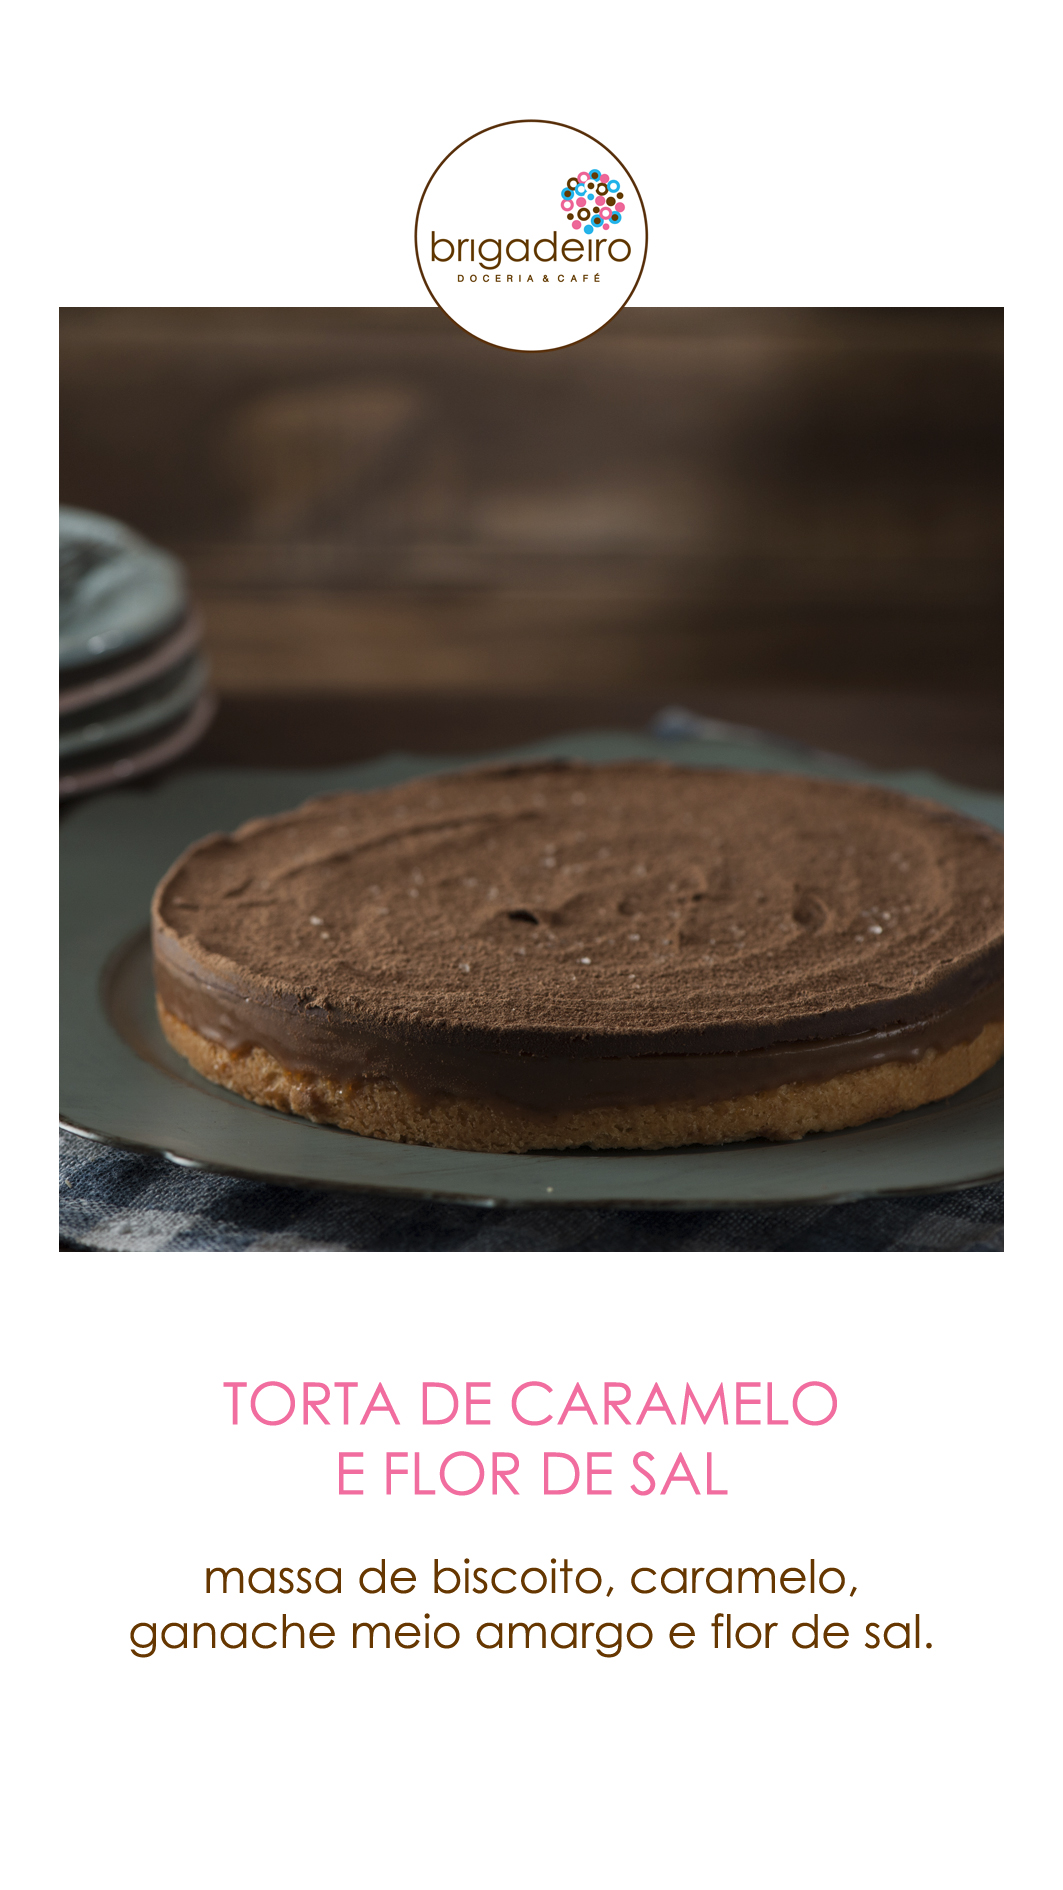 TORTA CARAMELO E FLOR DE SAL